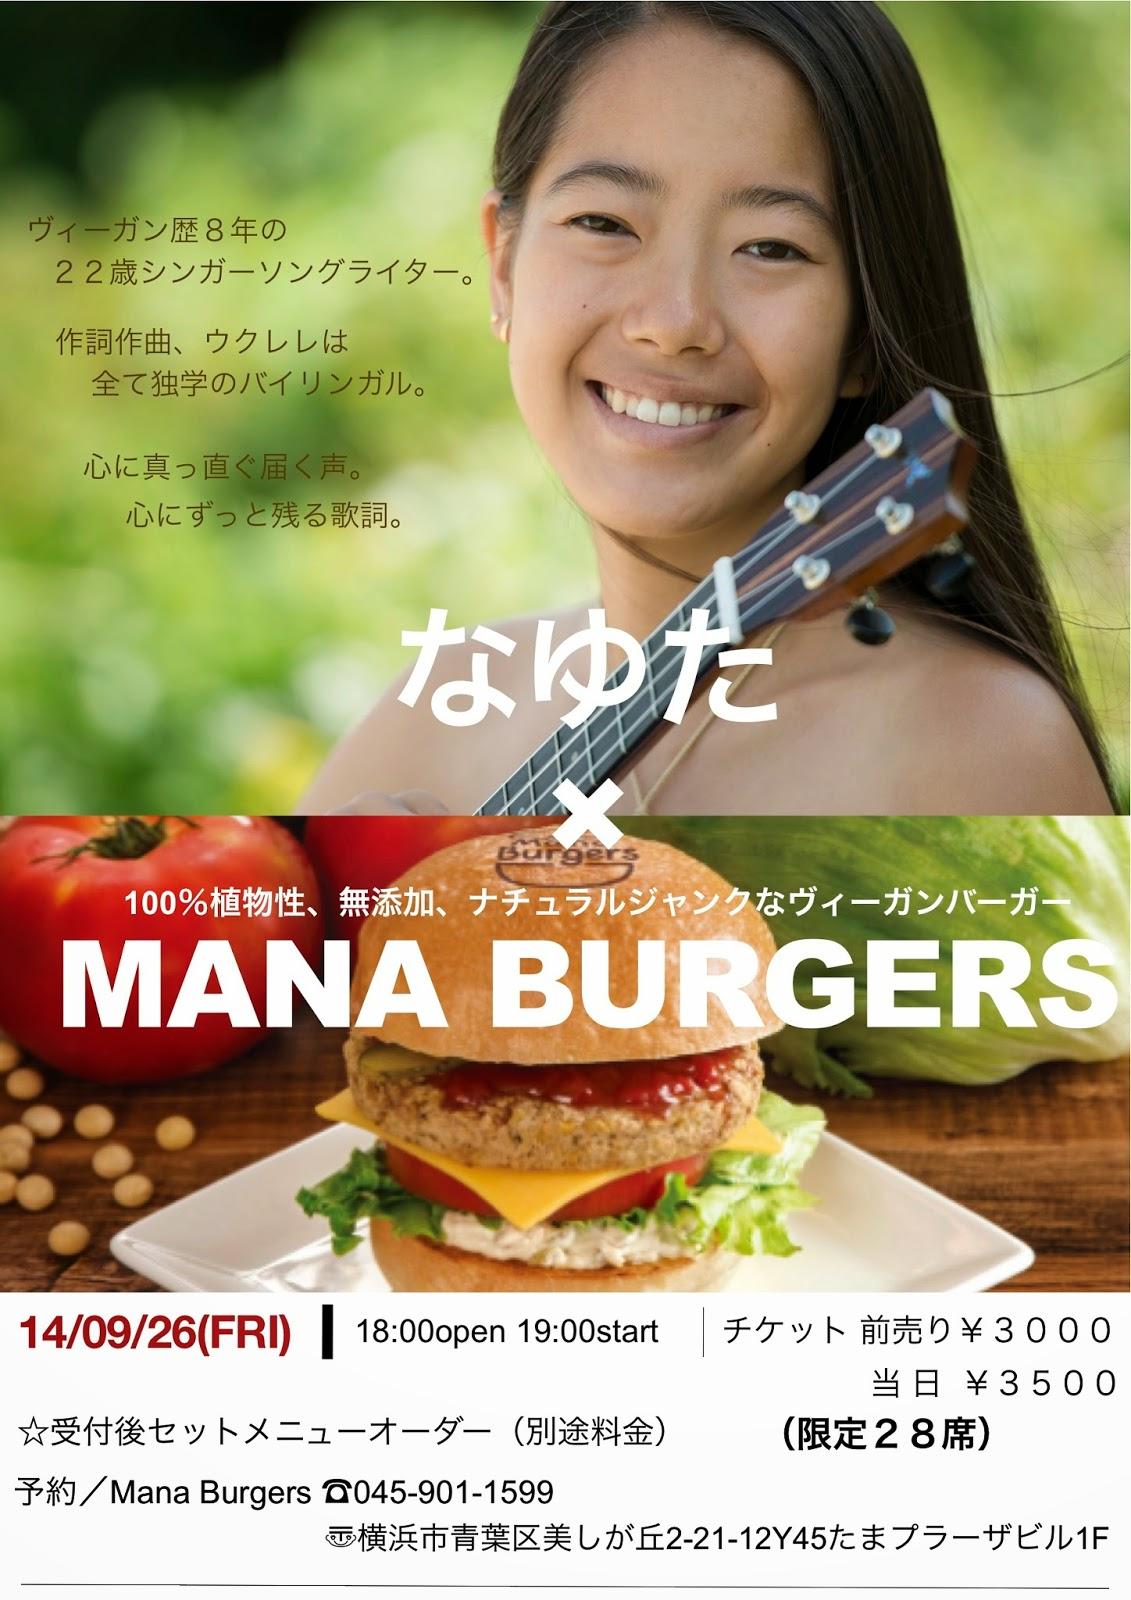 Mana_burgers